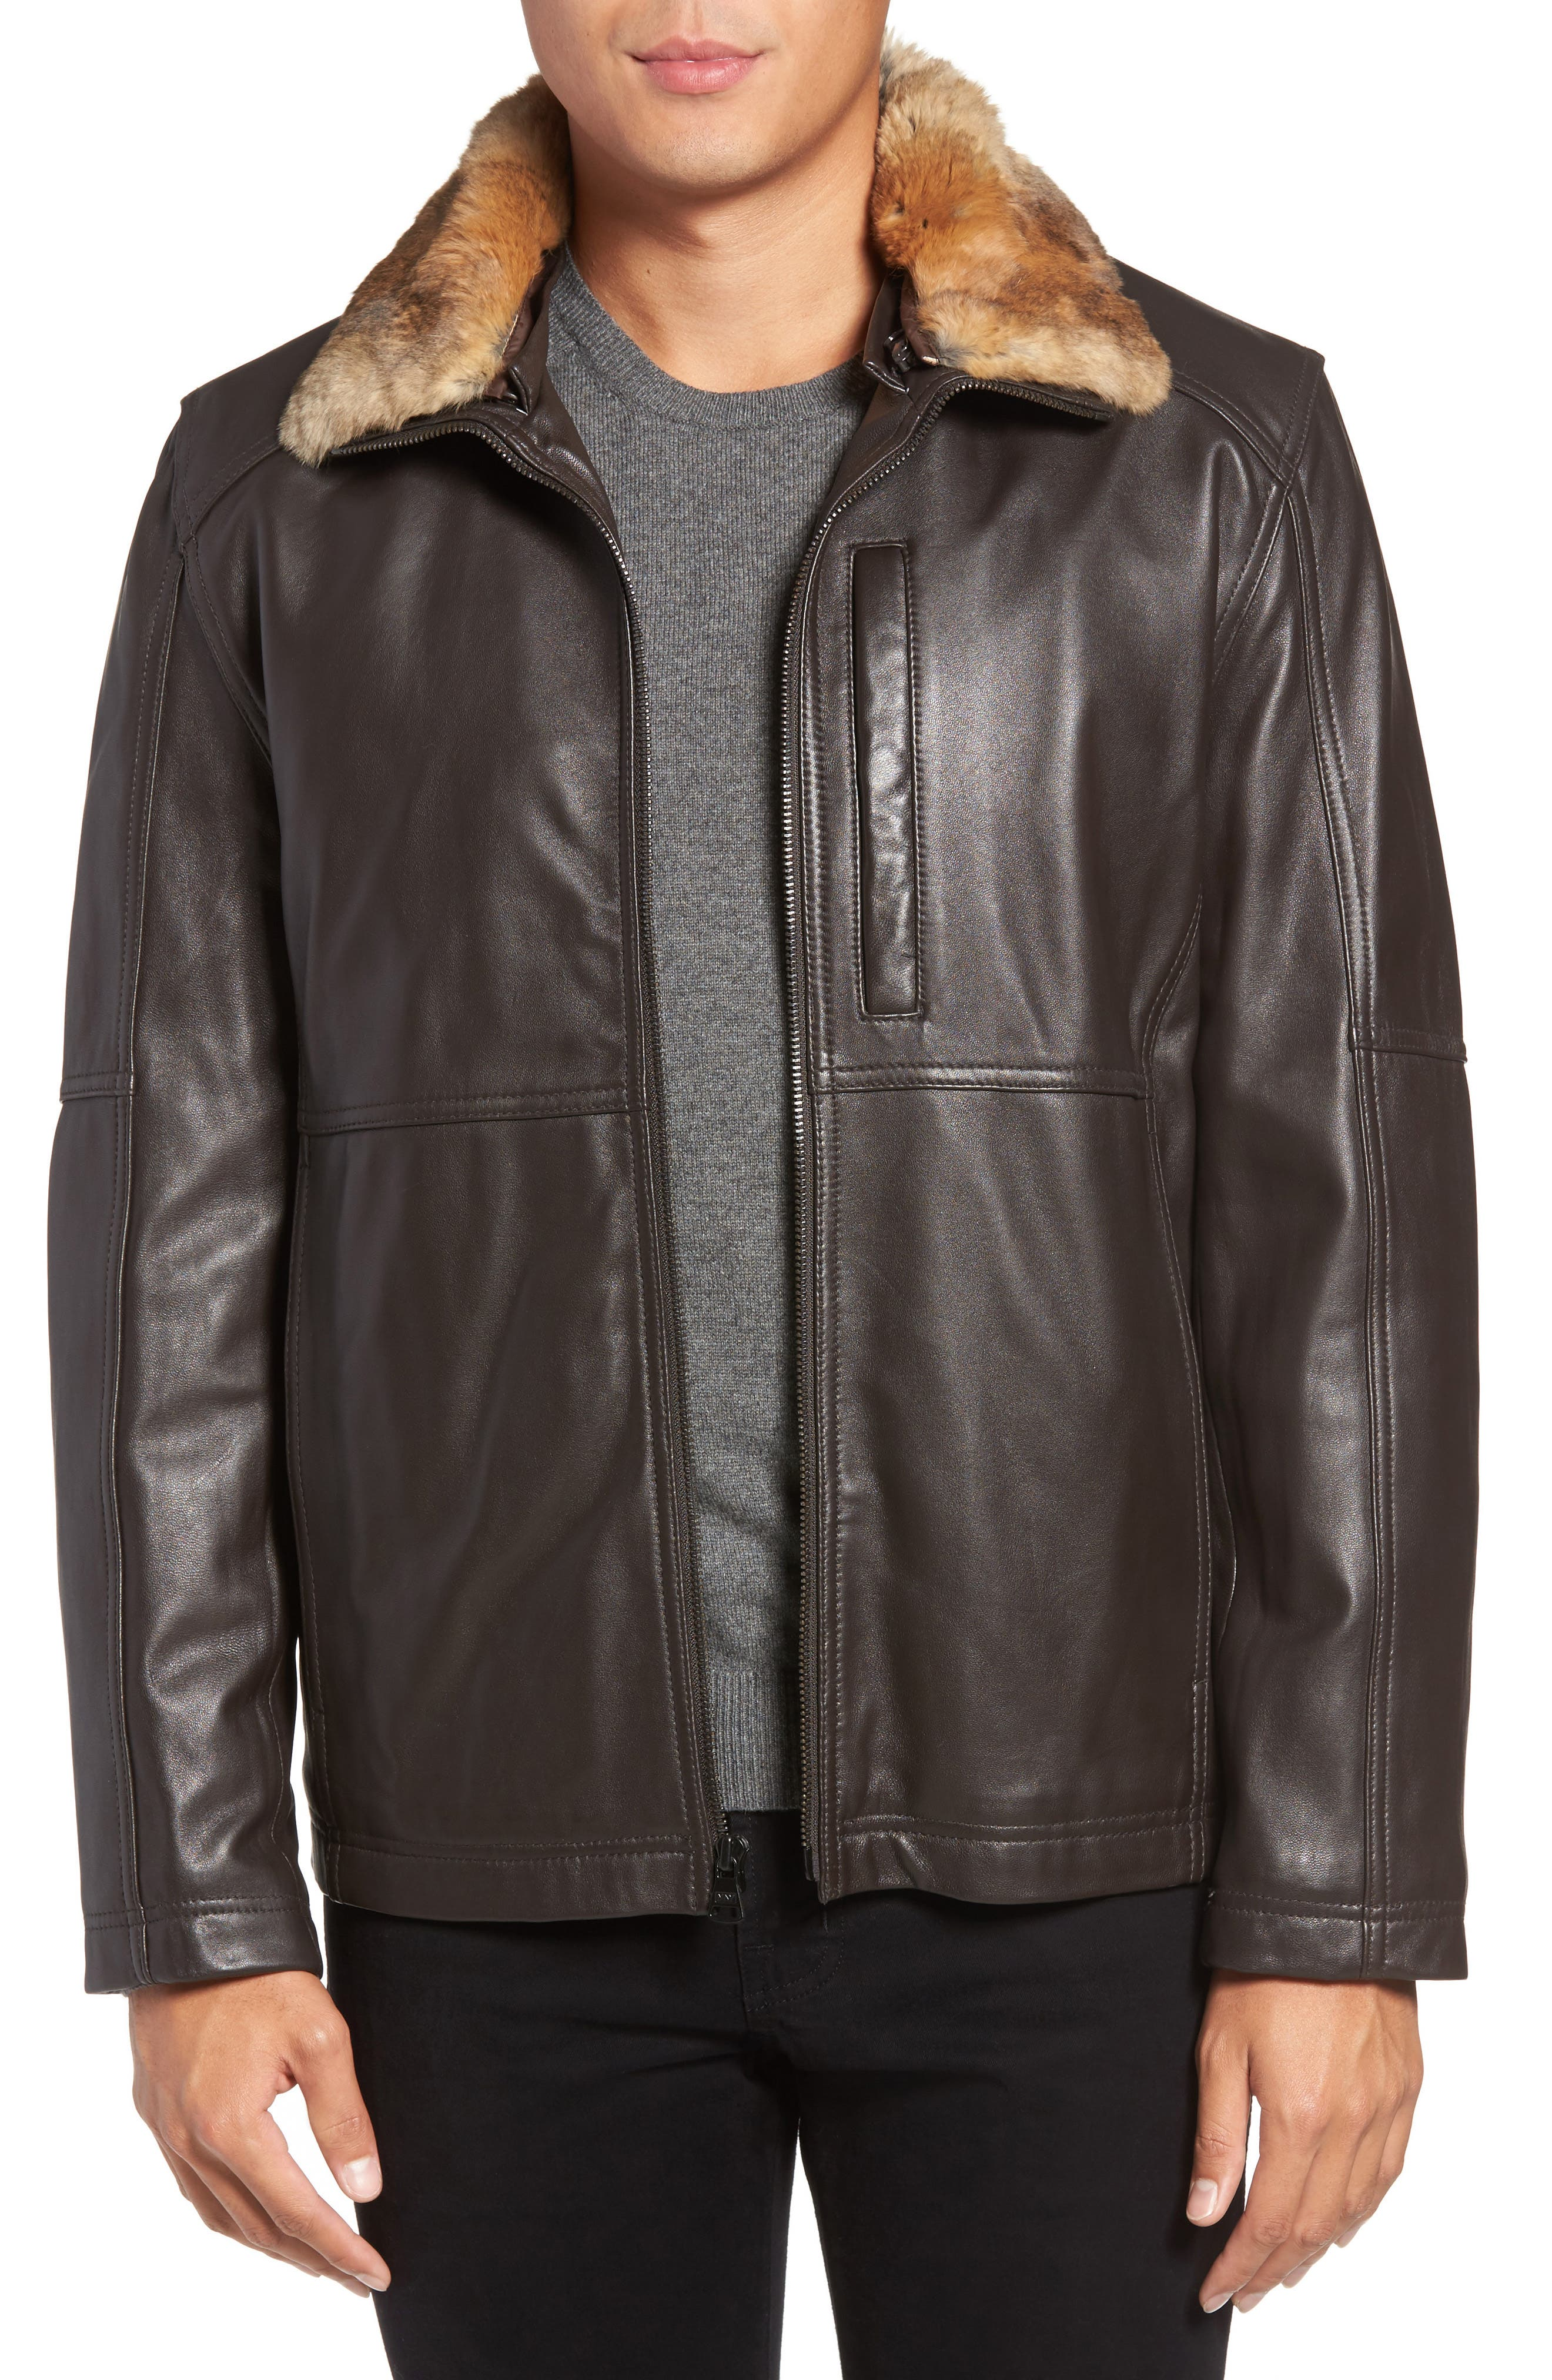 Alternate Image 1 Selected - Marc New York Lambskin Leather Jacket with Genuine Rabbit Fur Trim